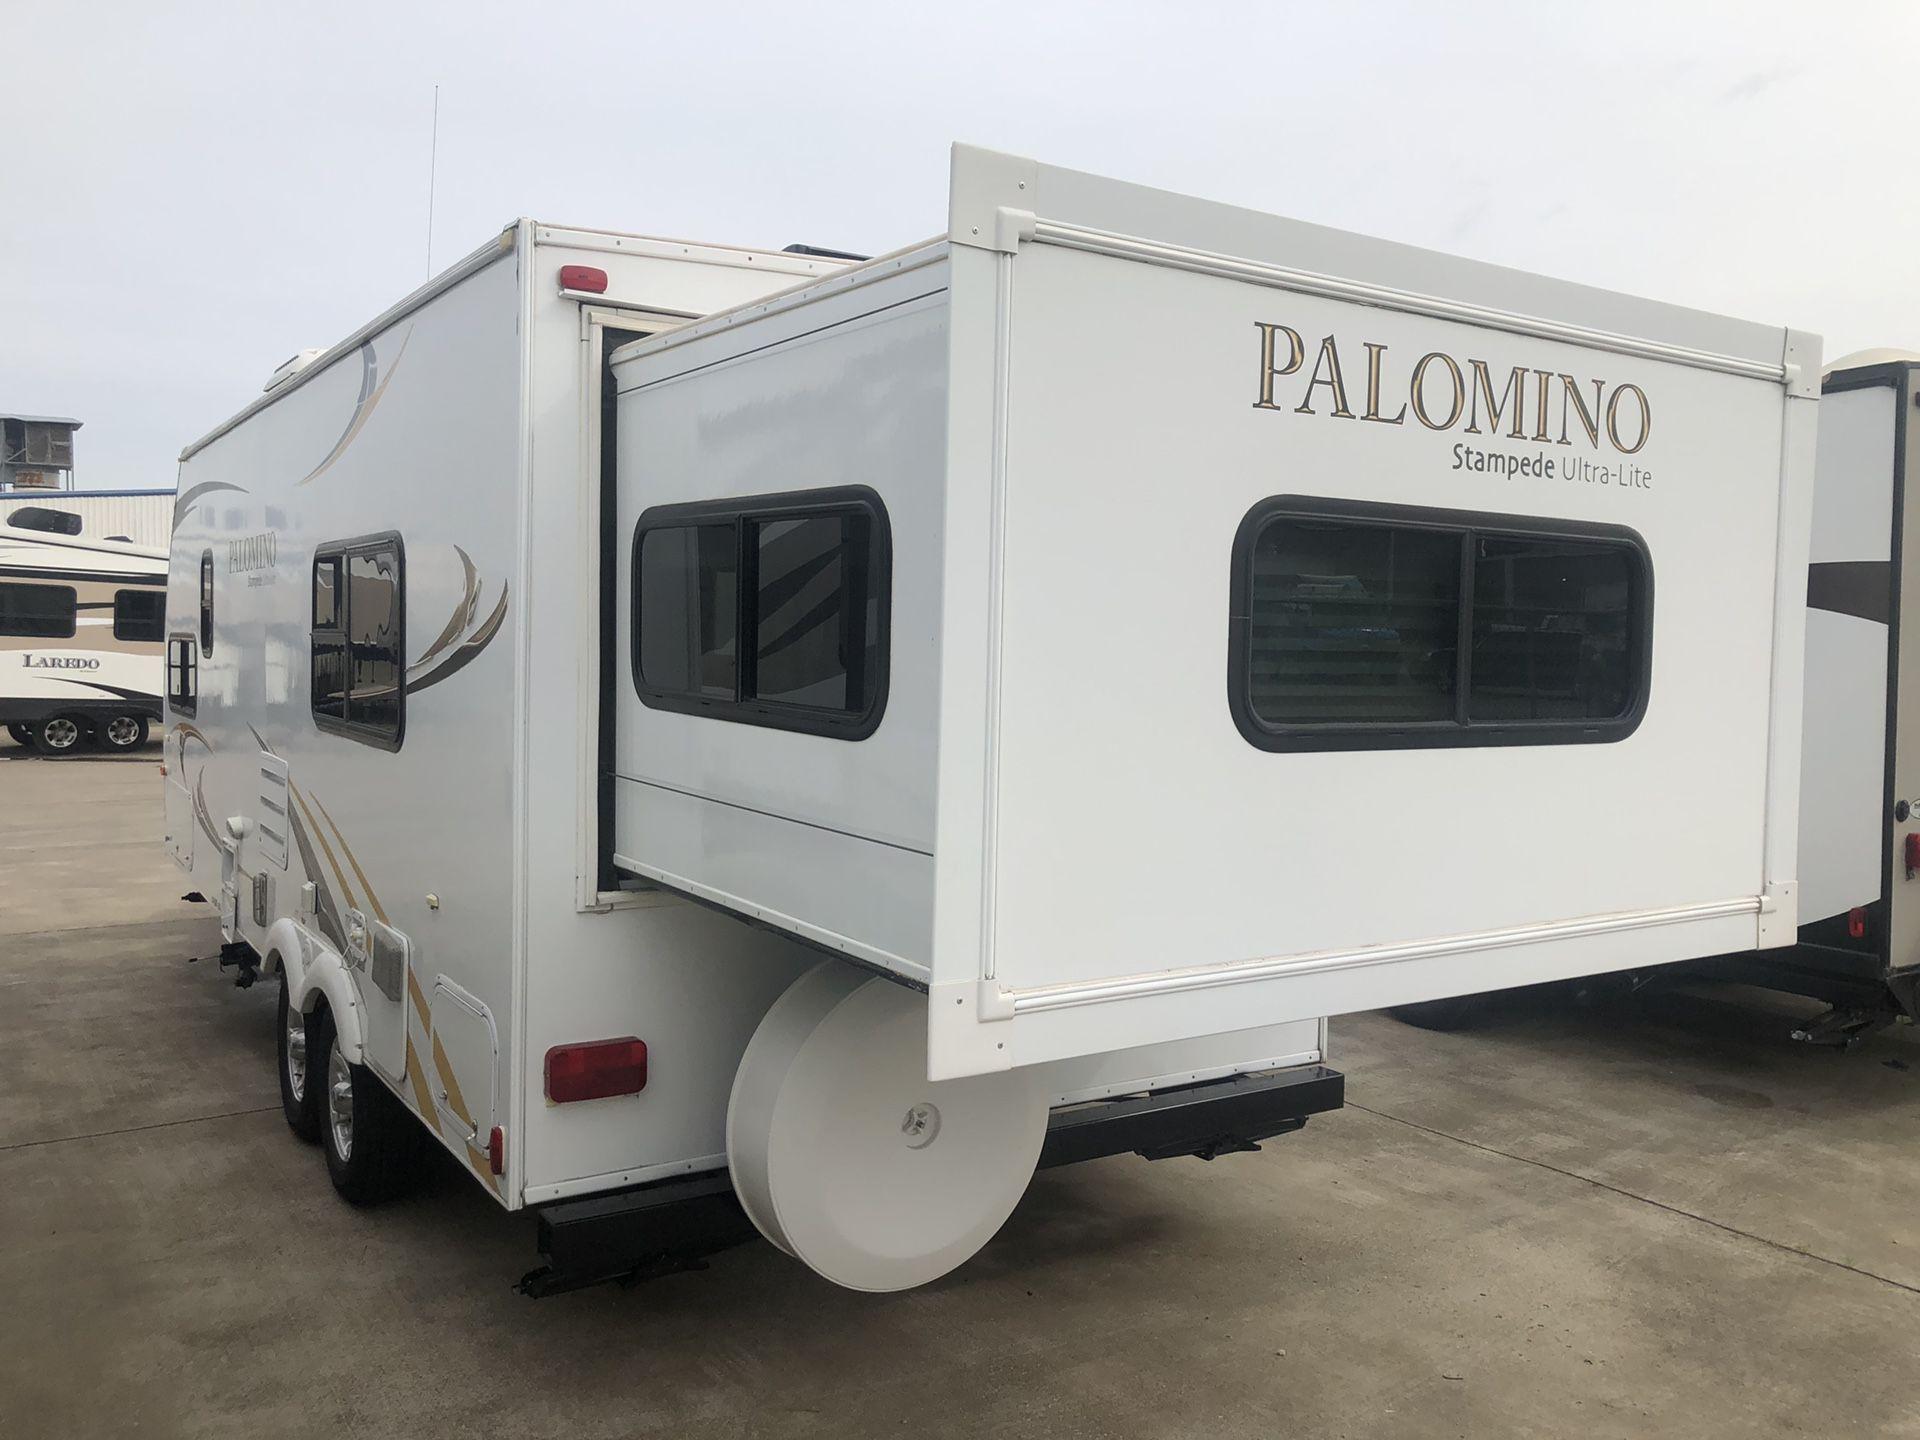 2011 Palomino Bunkhouse Stampede M-216 Used Travel Trailer RV